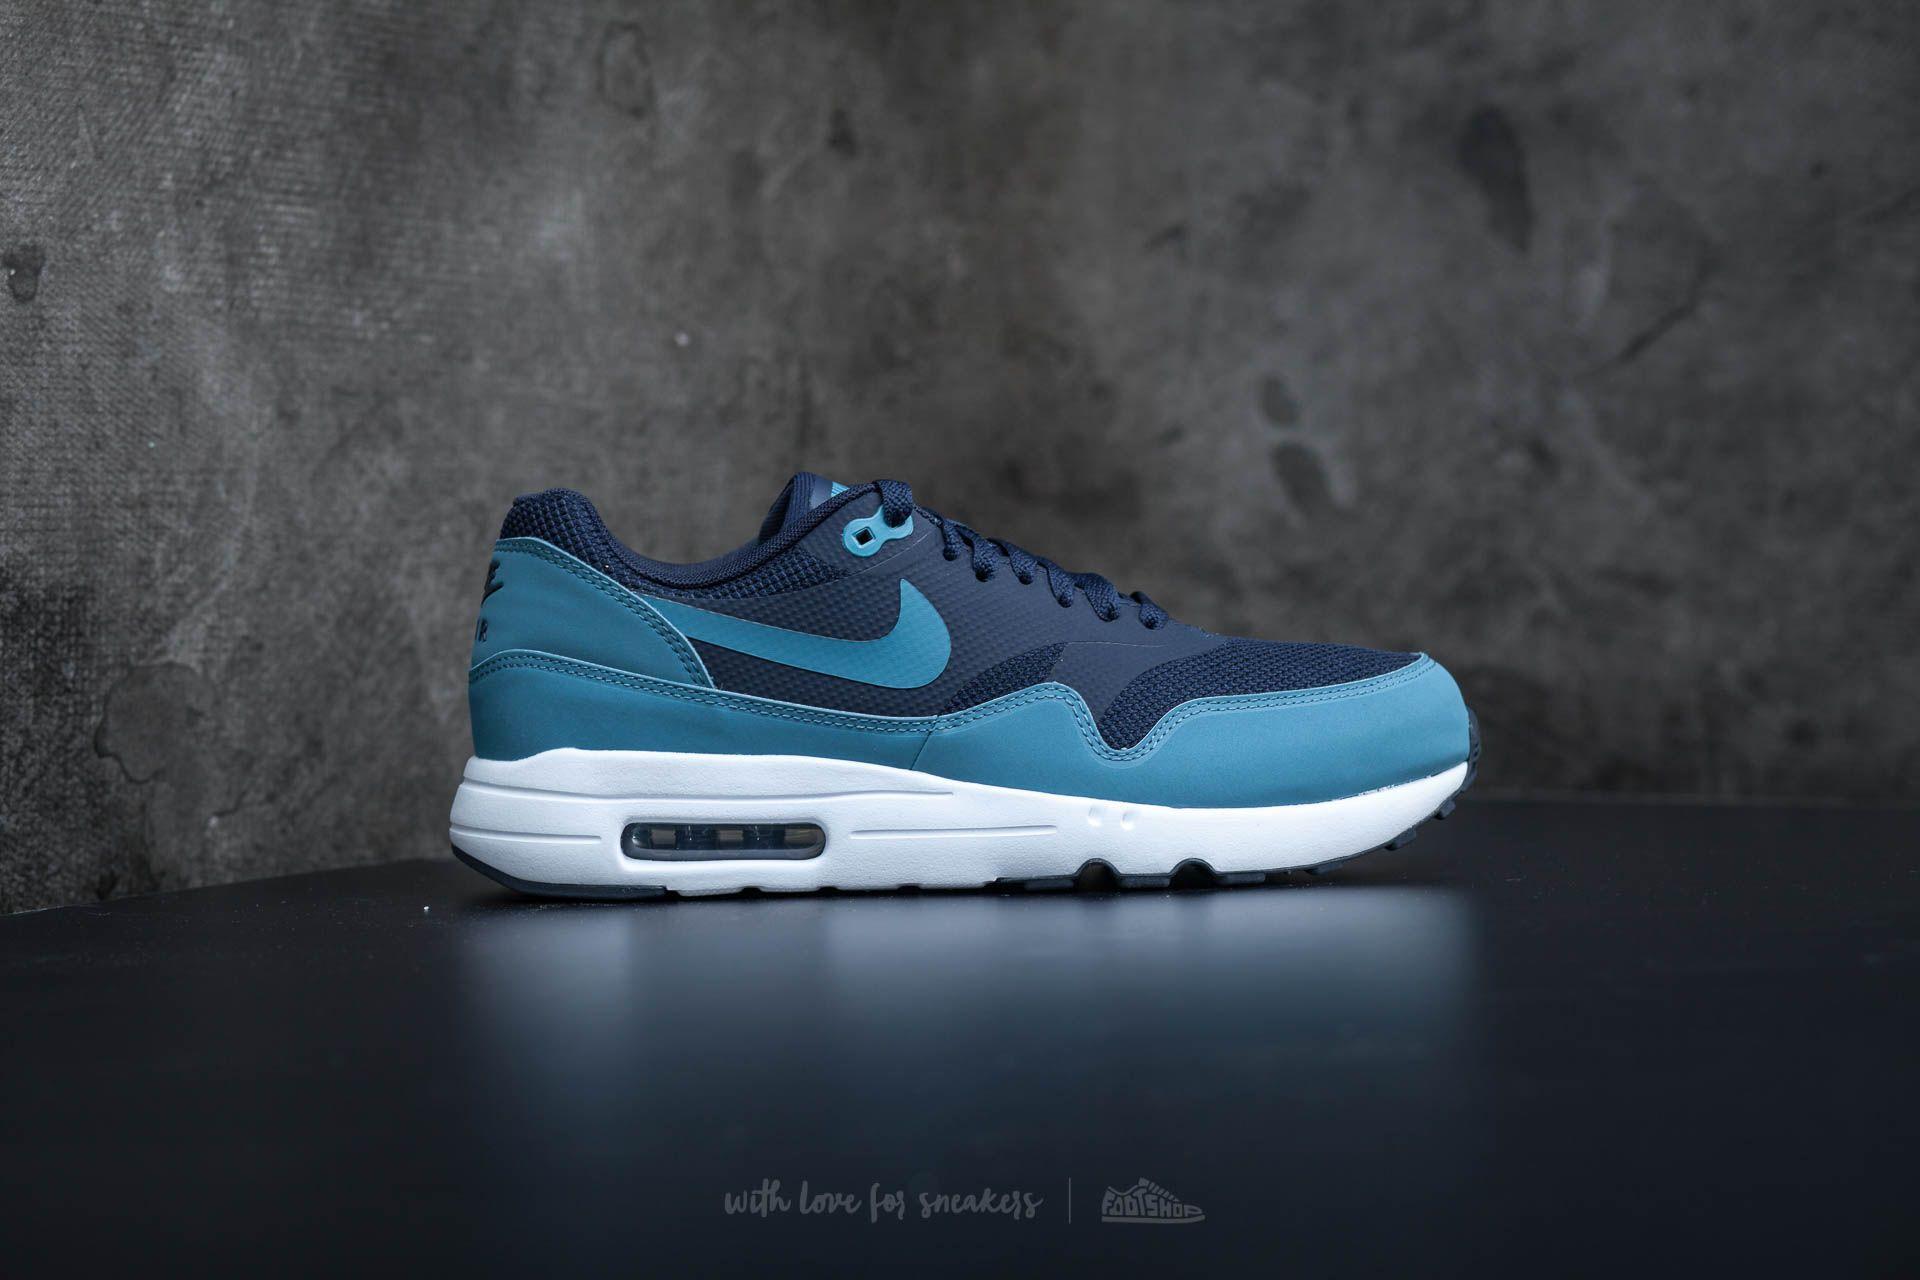 sneakers for cheap 5cc41 2e931 Lyst - Nike Air Max 1 Ultra 2.0 Essential Obsidian Smokey Bl